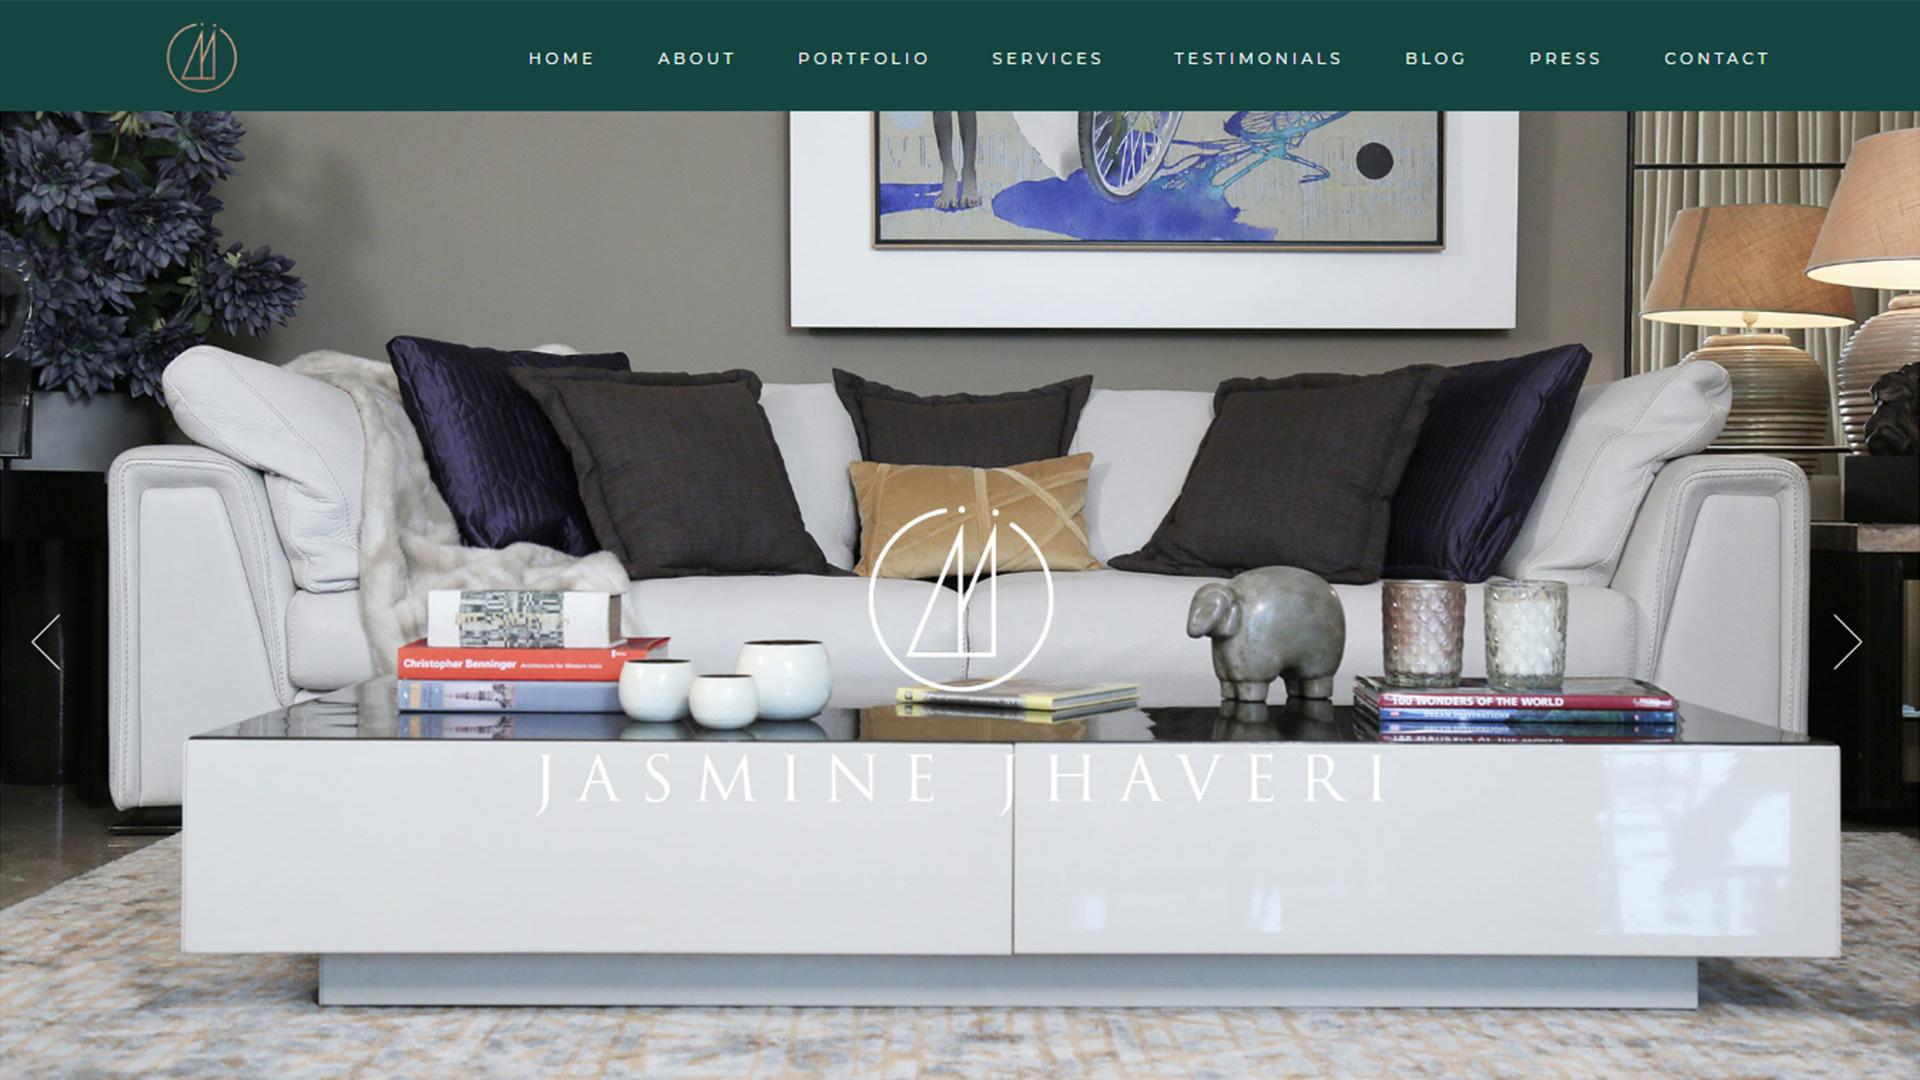 jasmine-web1